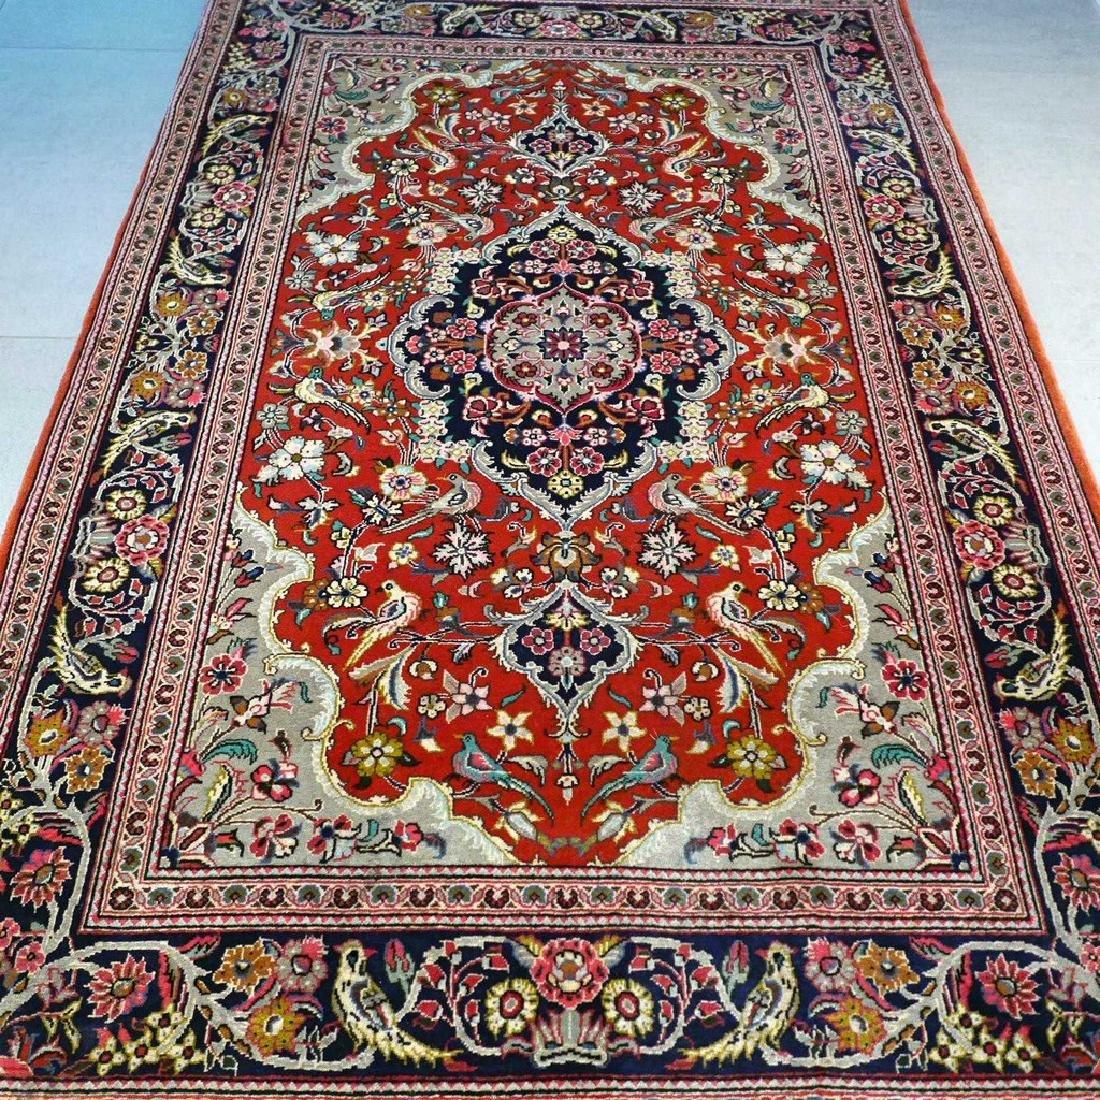 Qum Kork Wool on Cotton Rug 5.4x3.6 - 6